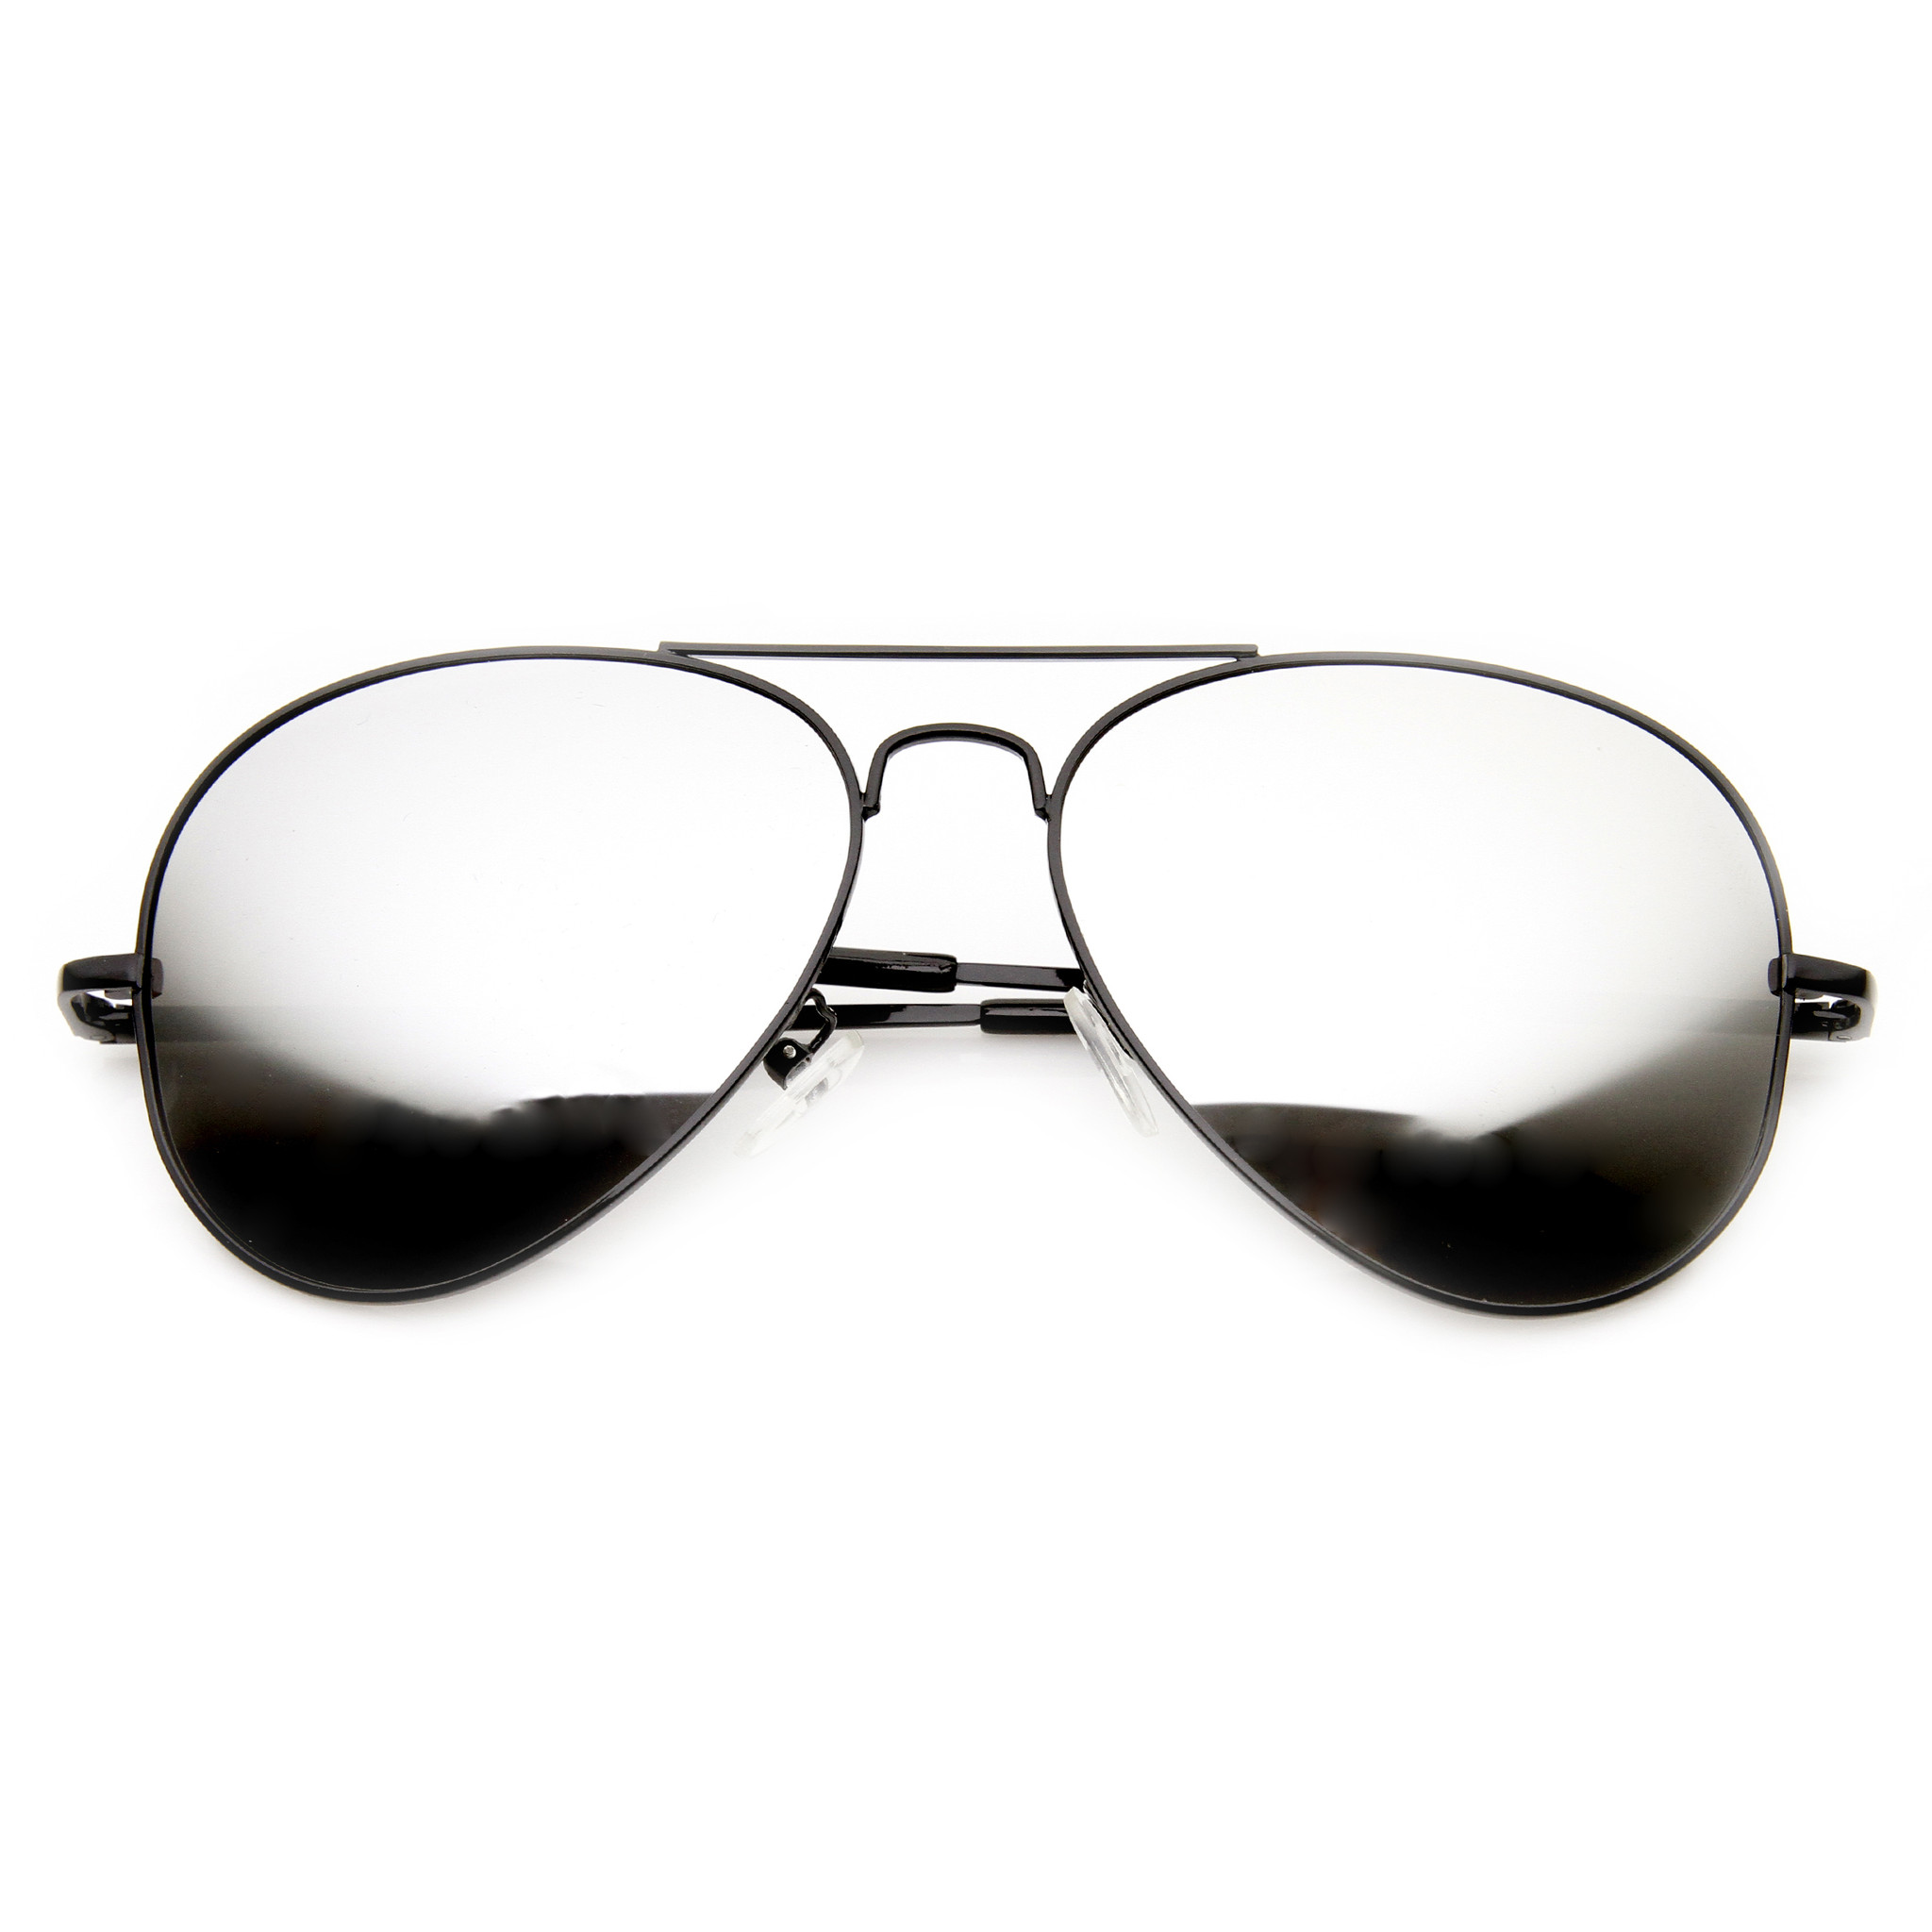 Premium Military Classic Mirrored Lens Metal Aviator Sunglasses 1375